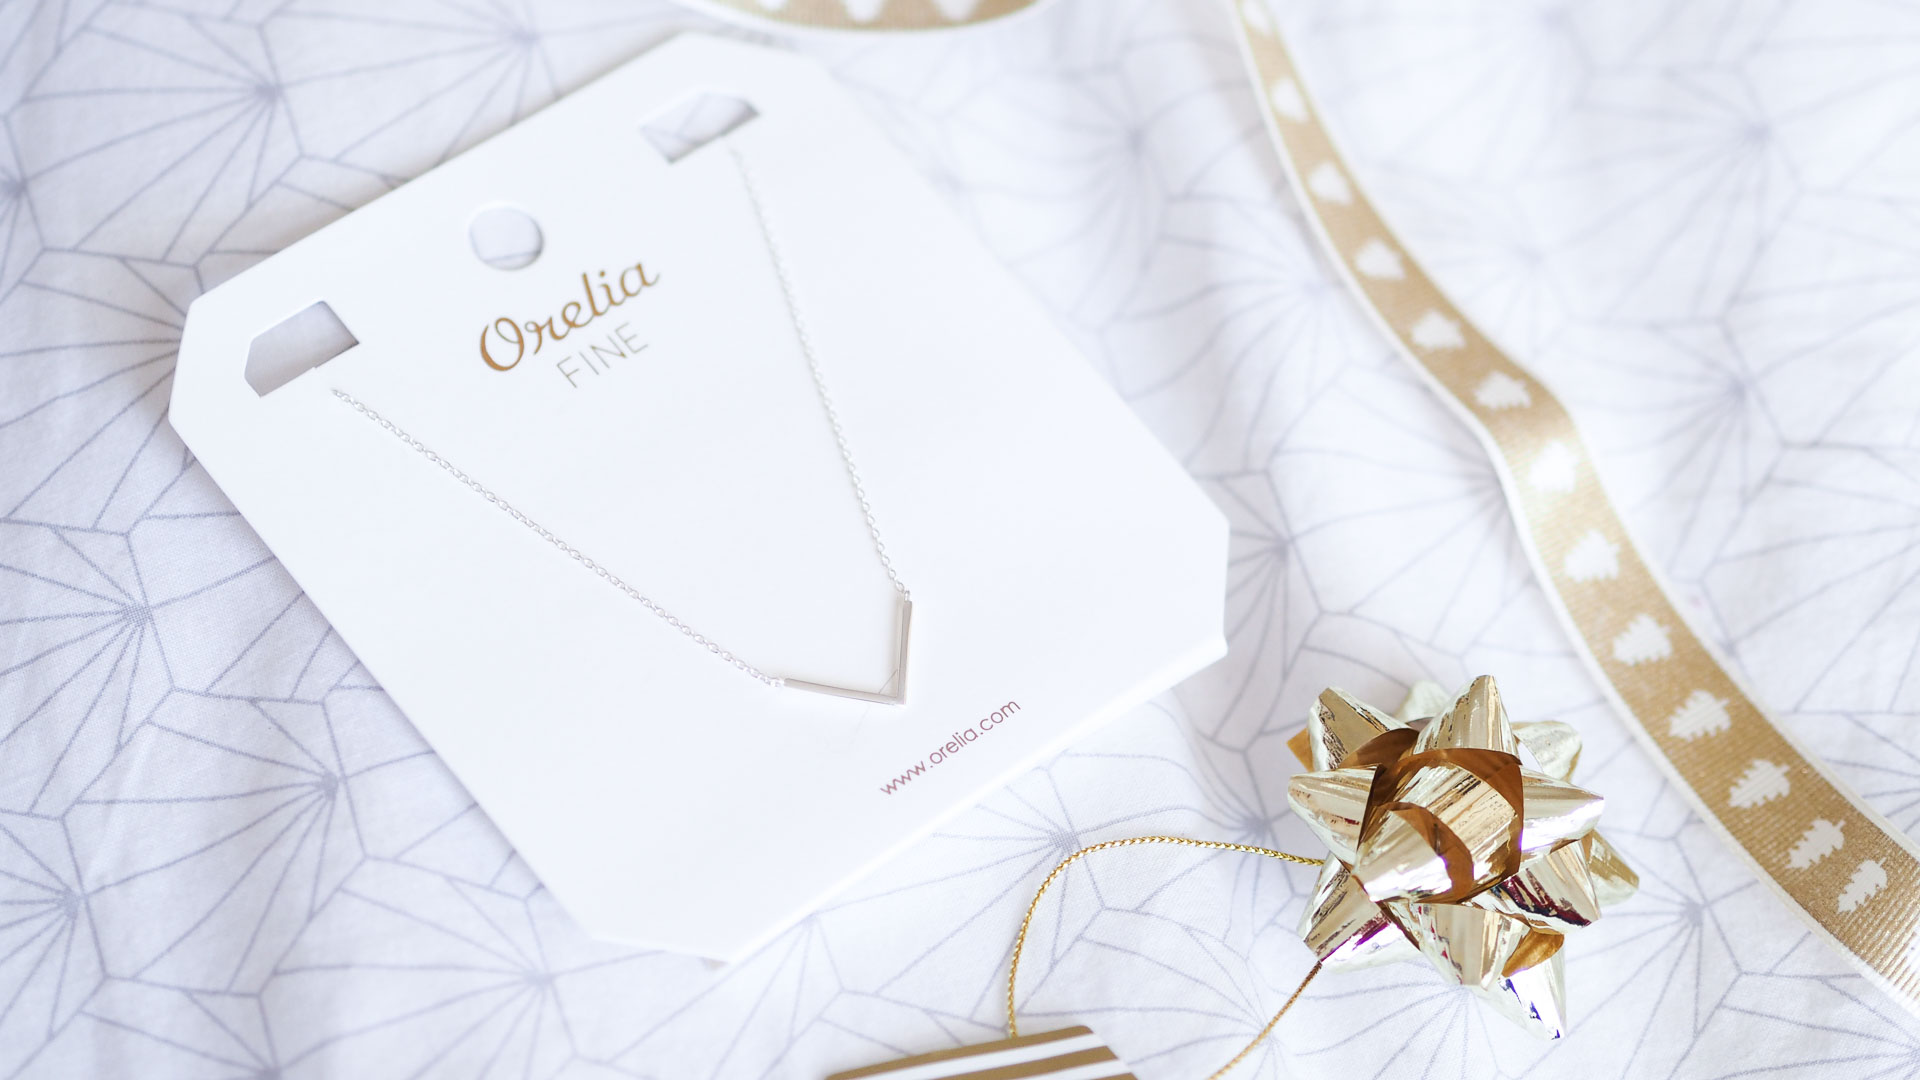 Orelia jewellery gift. christmas gifts for her